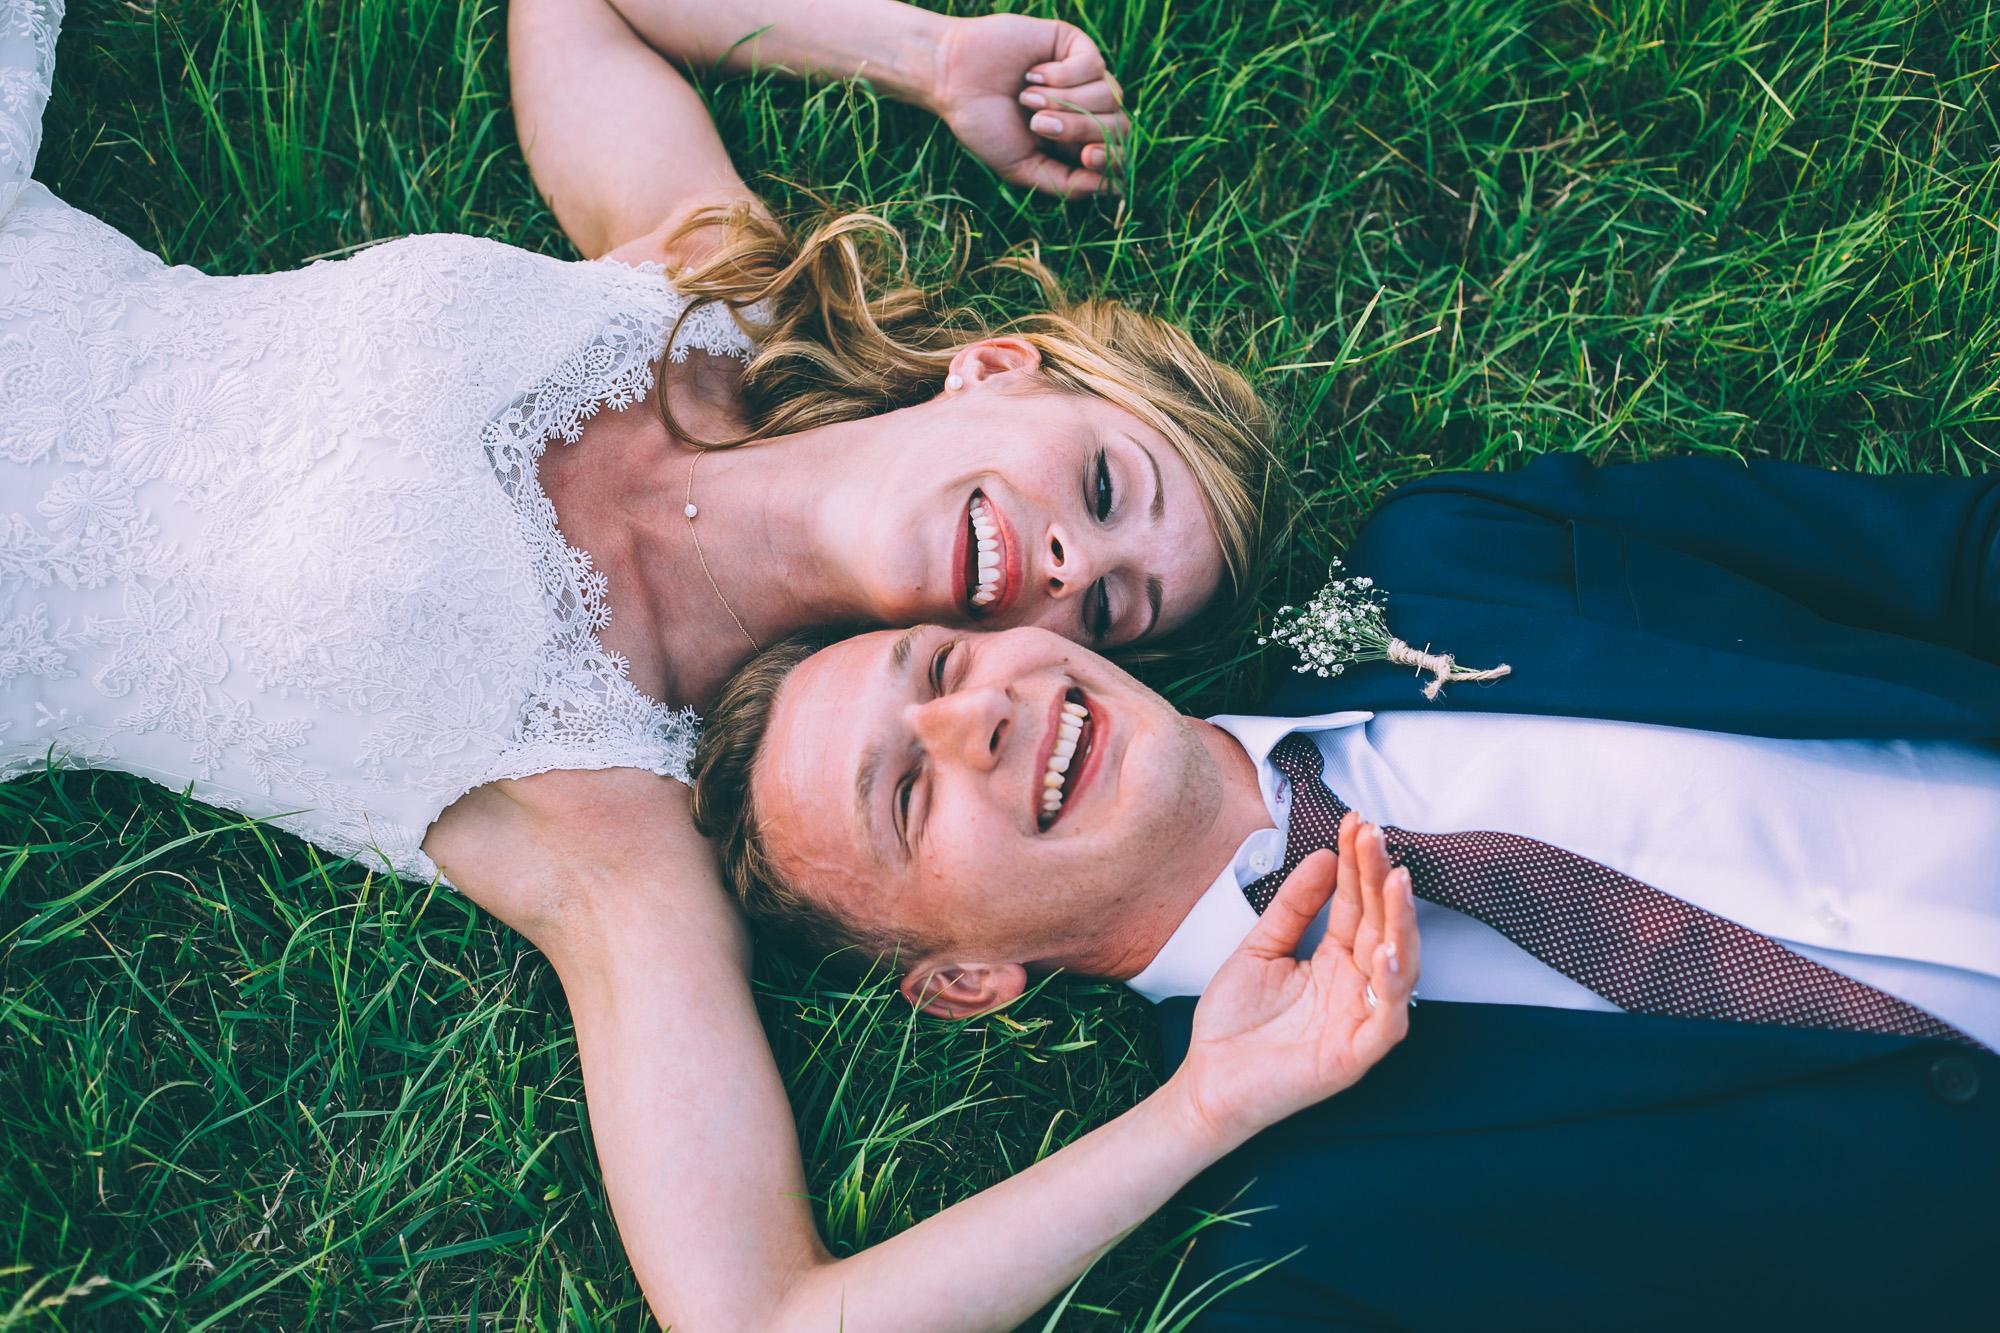 Sarah&Rich_wedding_18.07.15_tombiddle_tb522.jpg